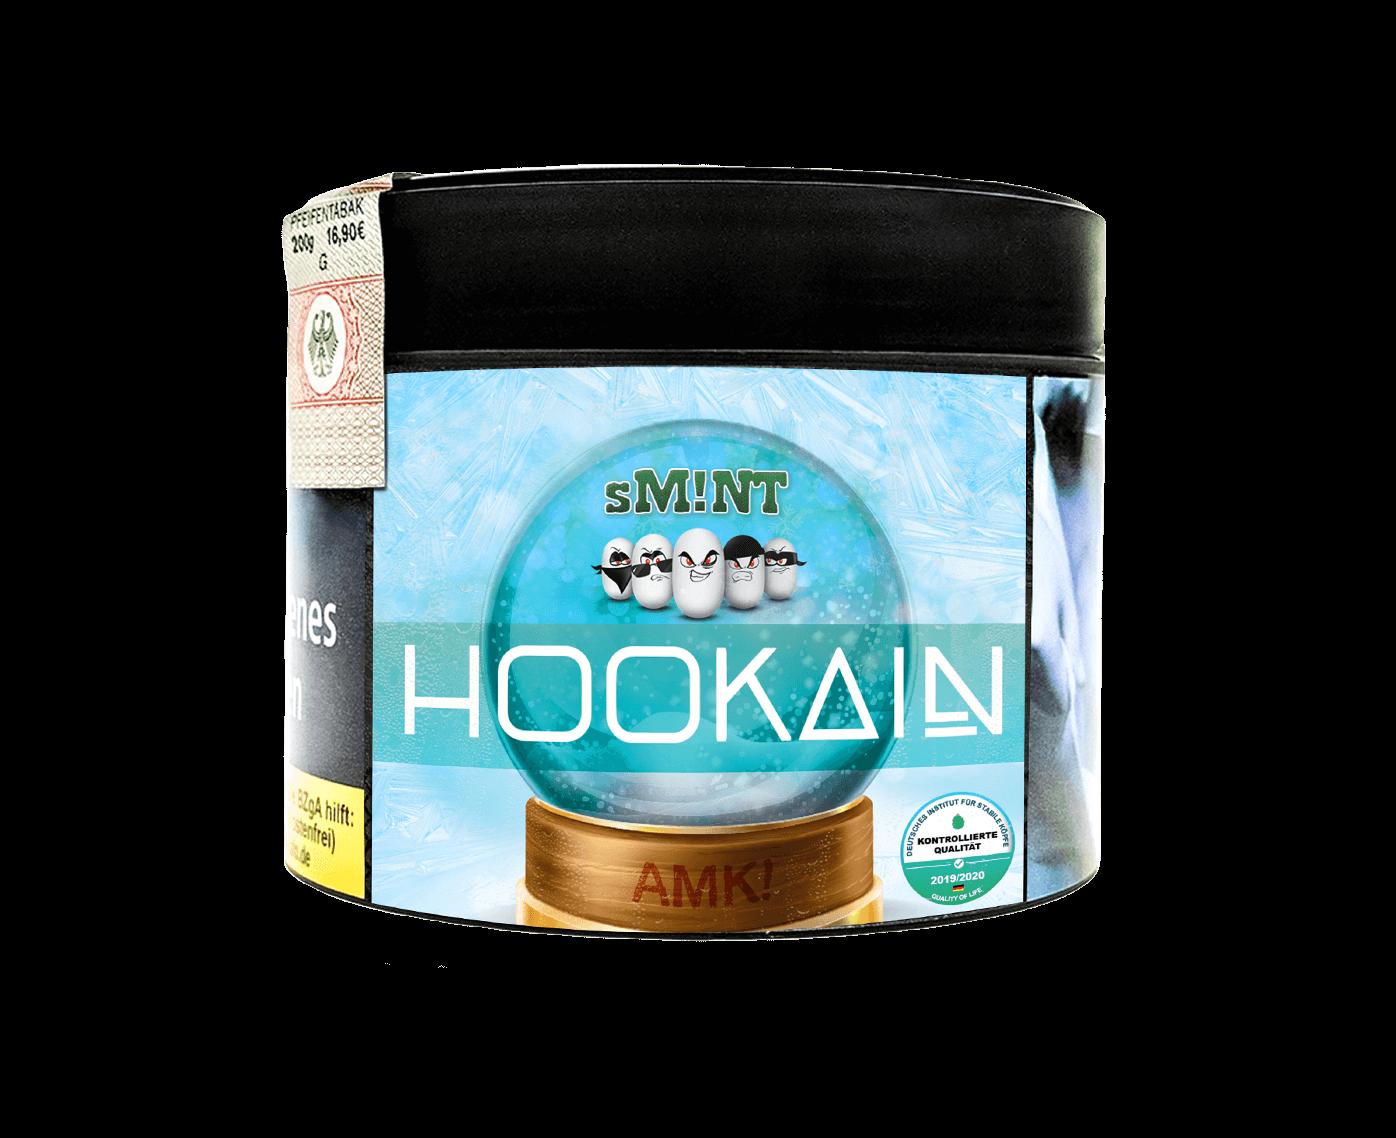 Hookain smint 200g